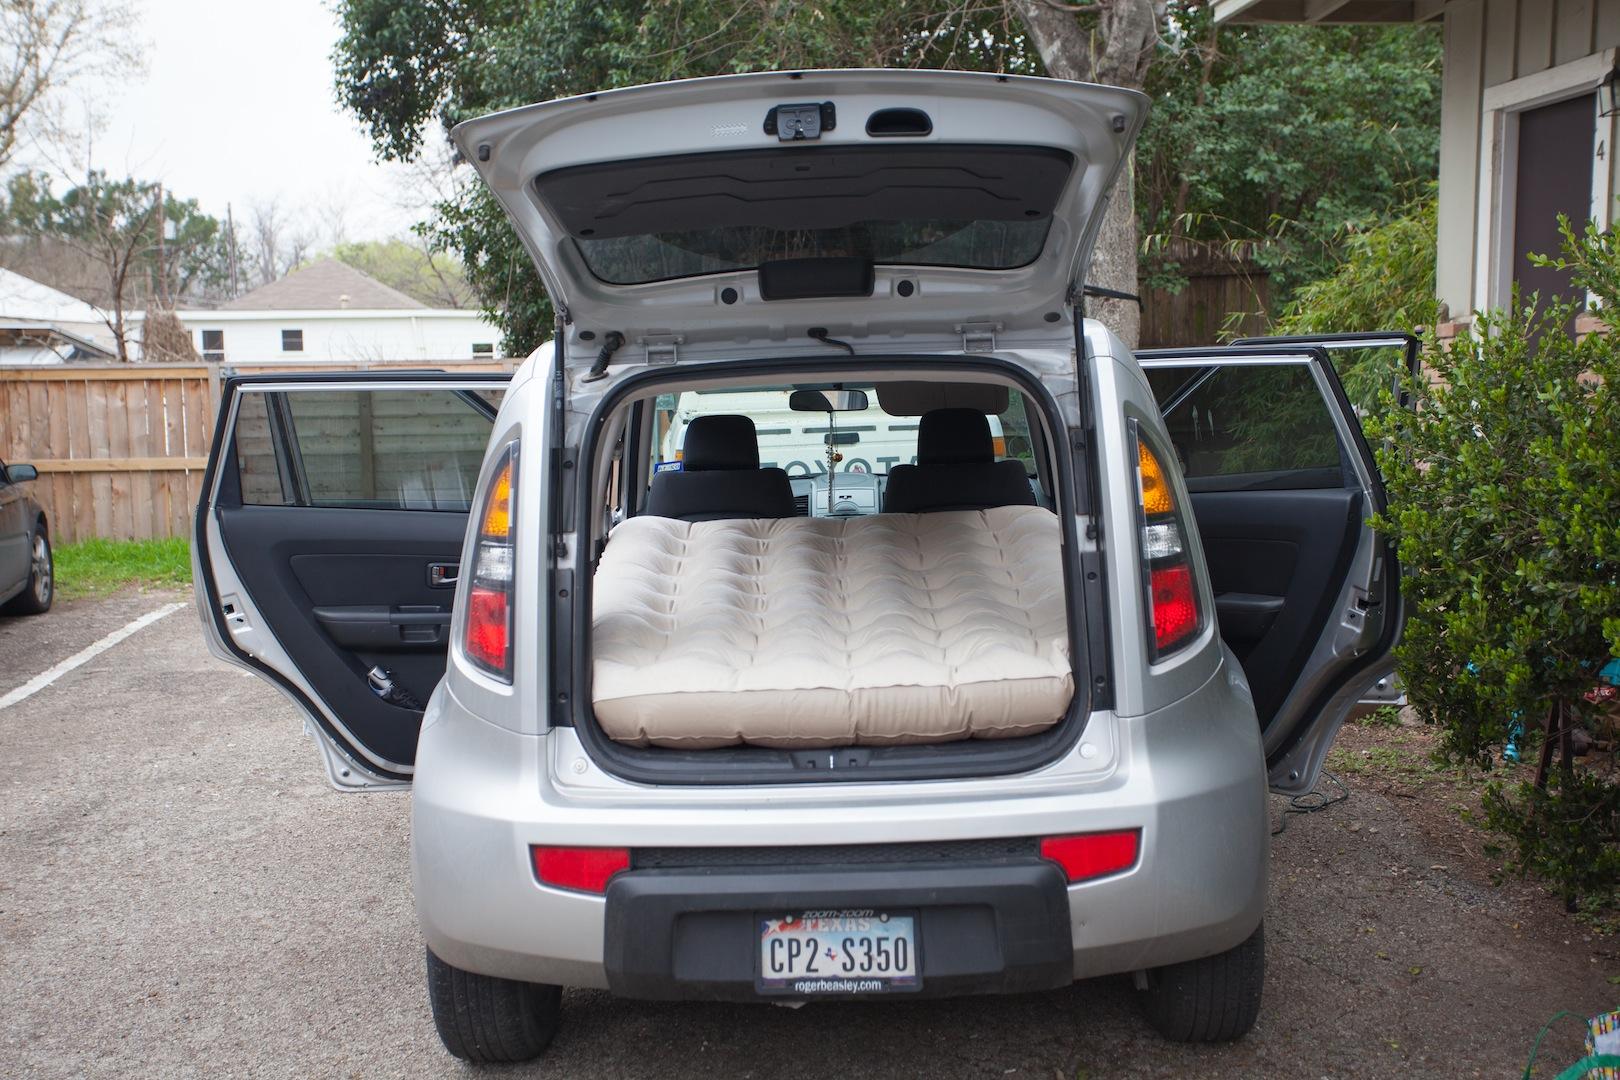 Camp-Sleep-Kia-Soul-Camping-Sleeping-11.jpg